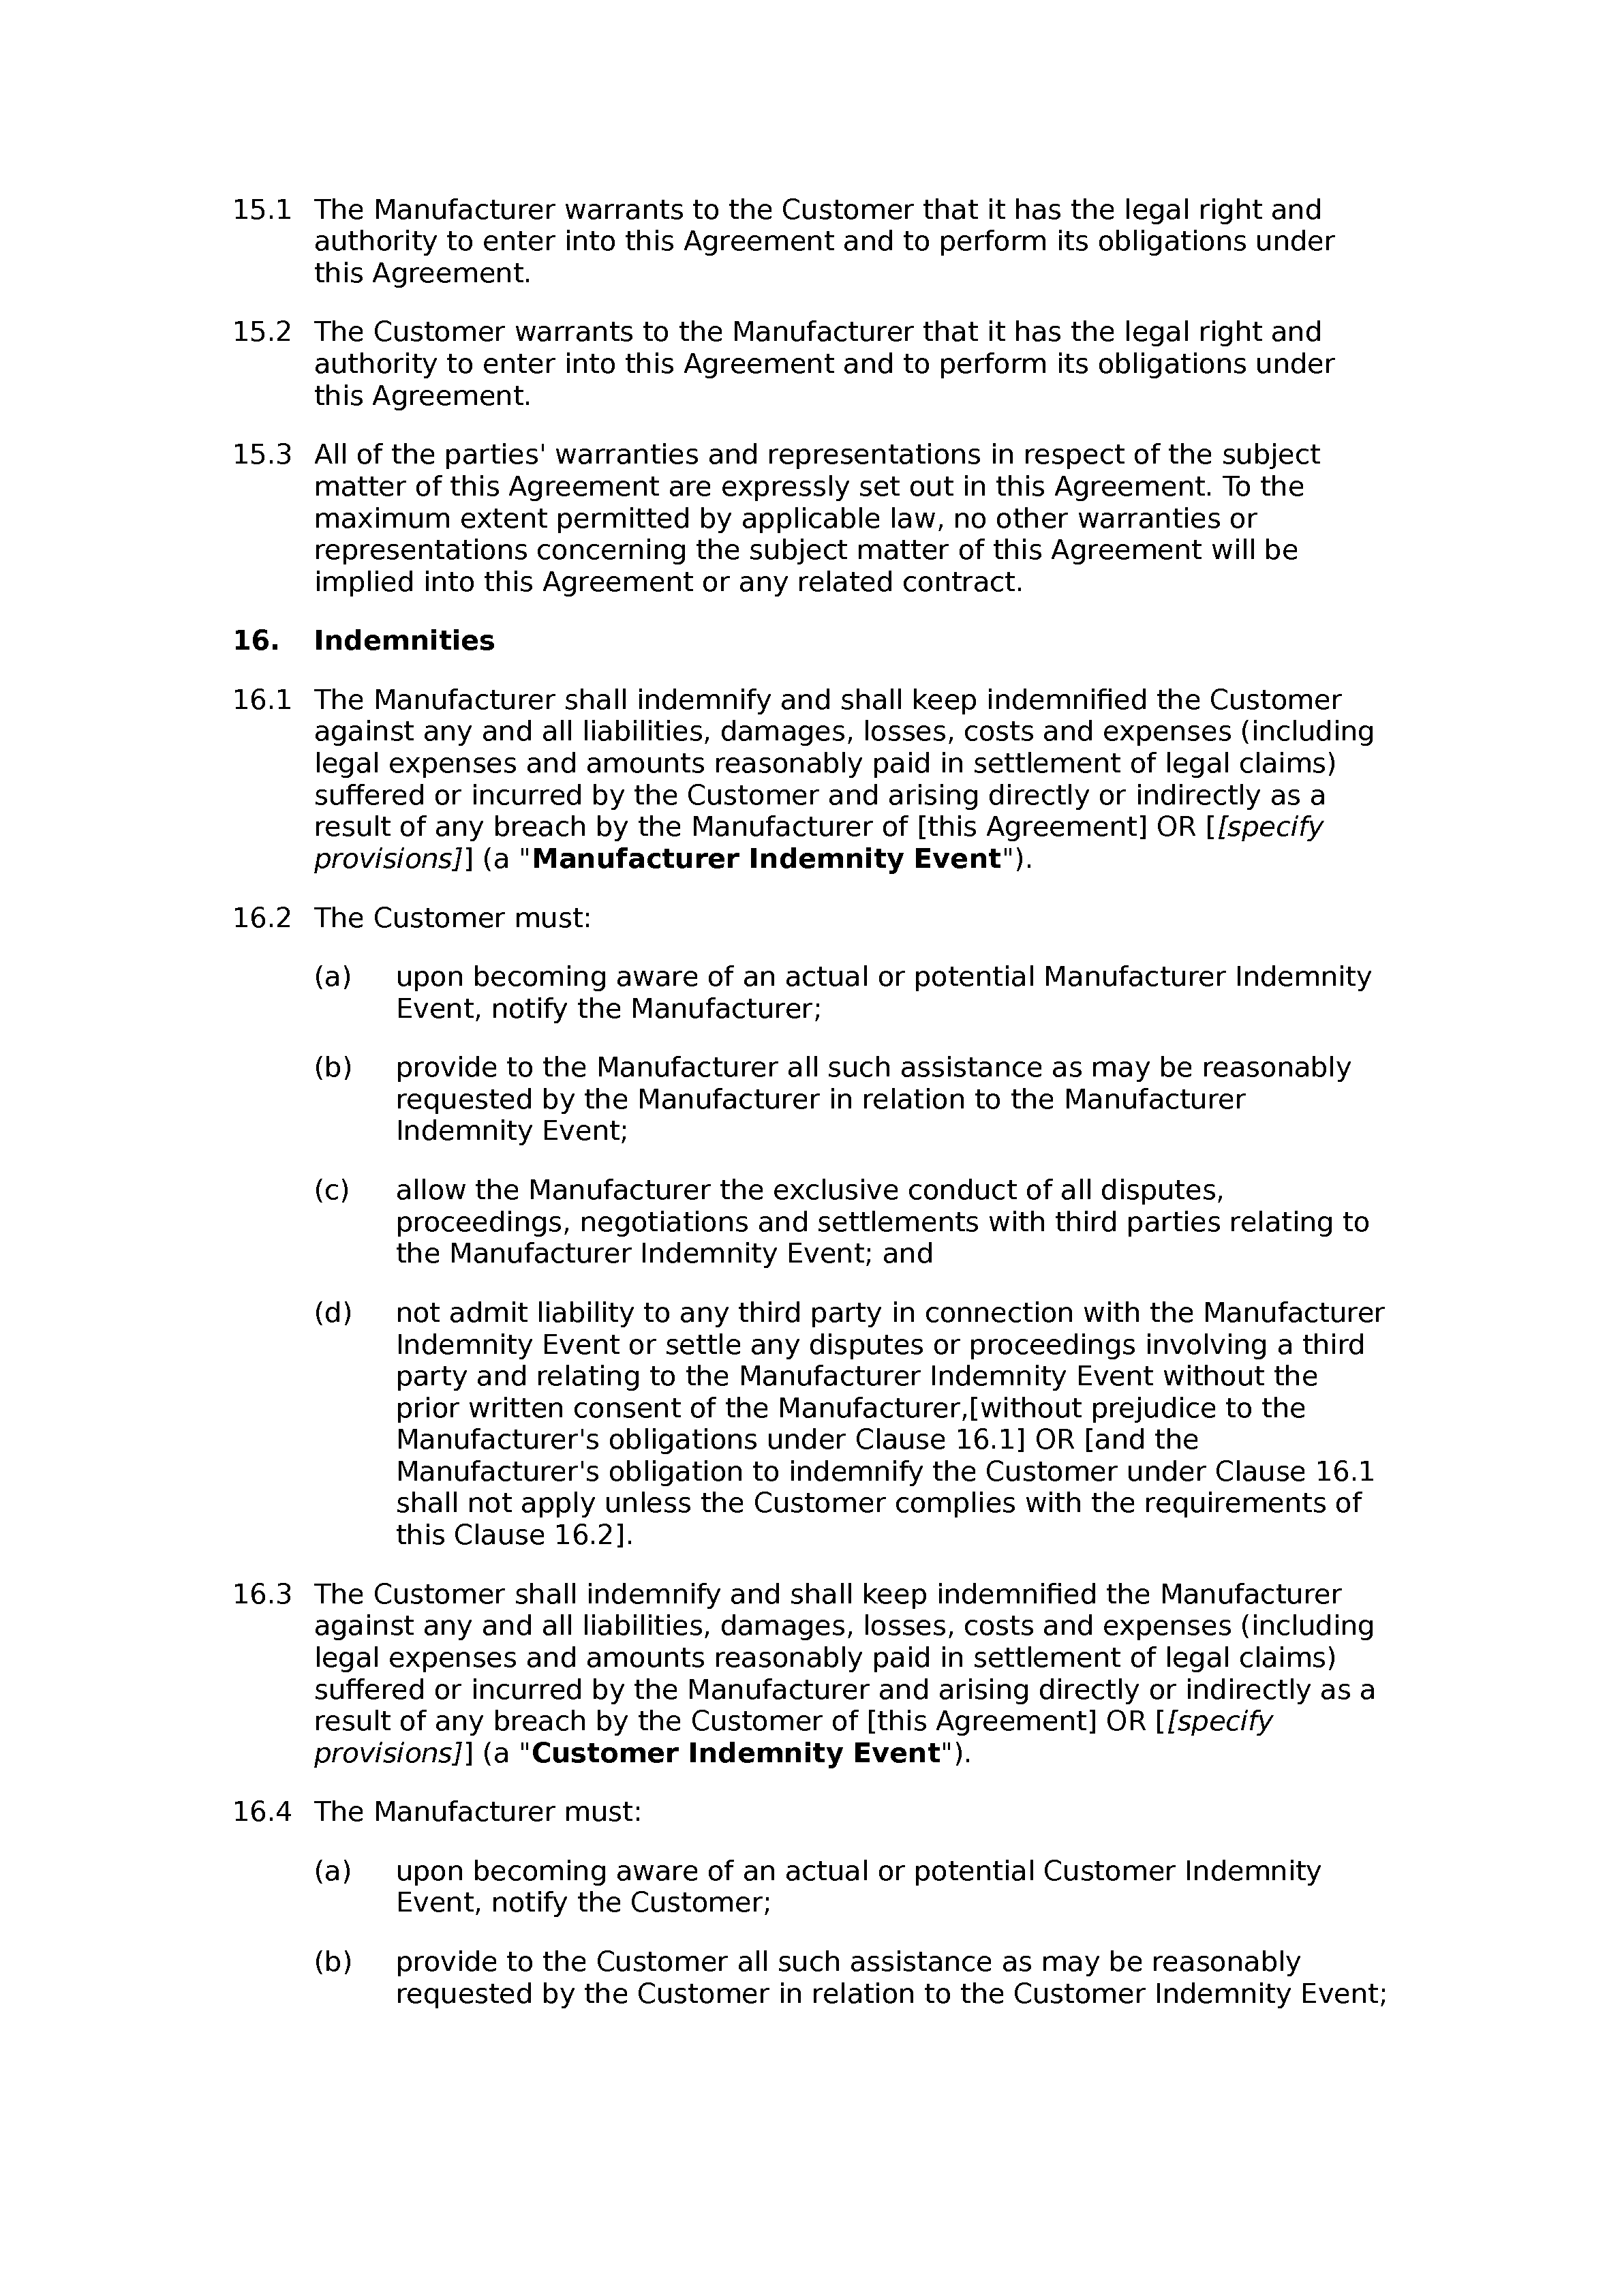 Free Manufacturing Agreement Docular